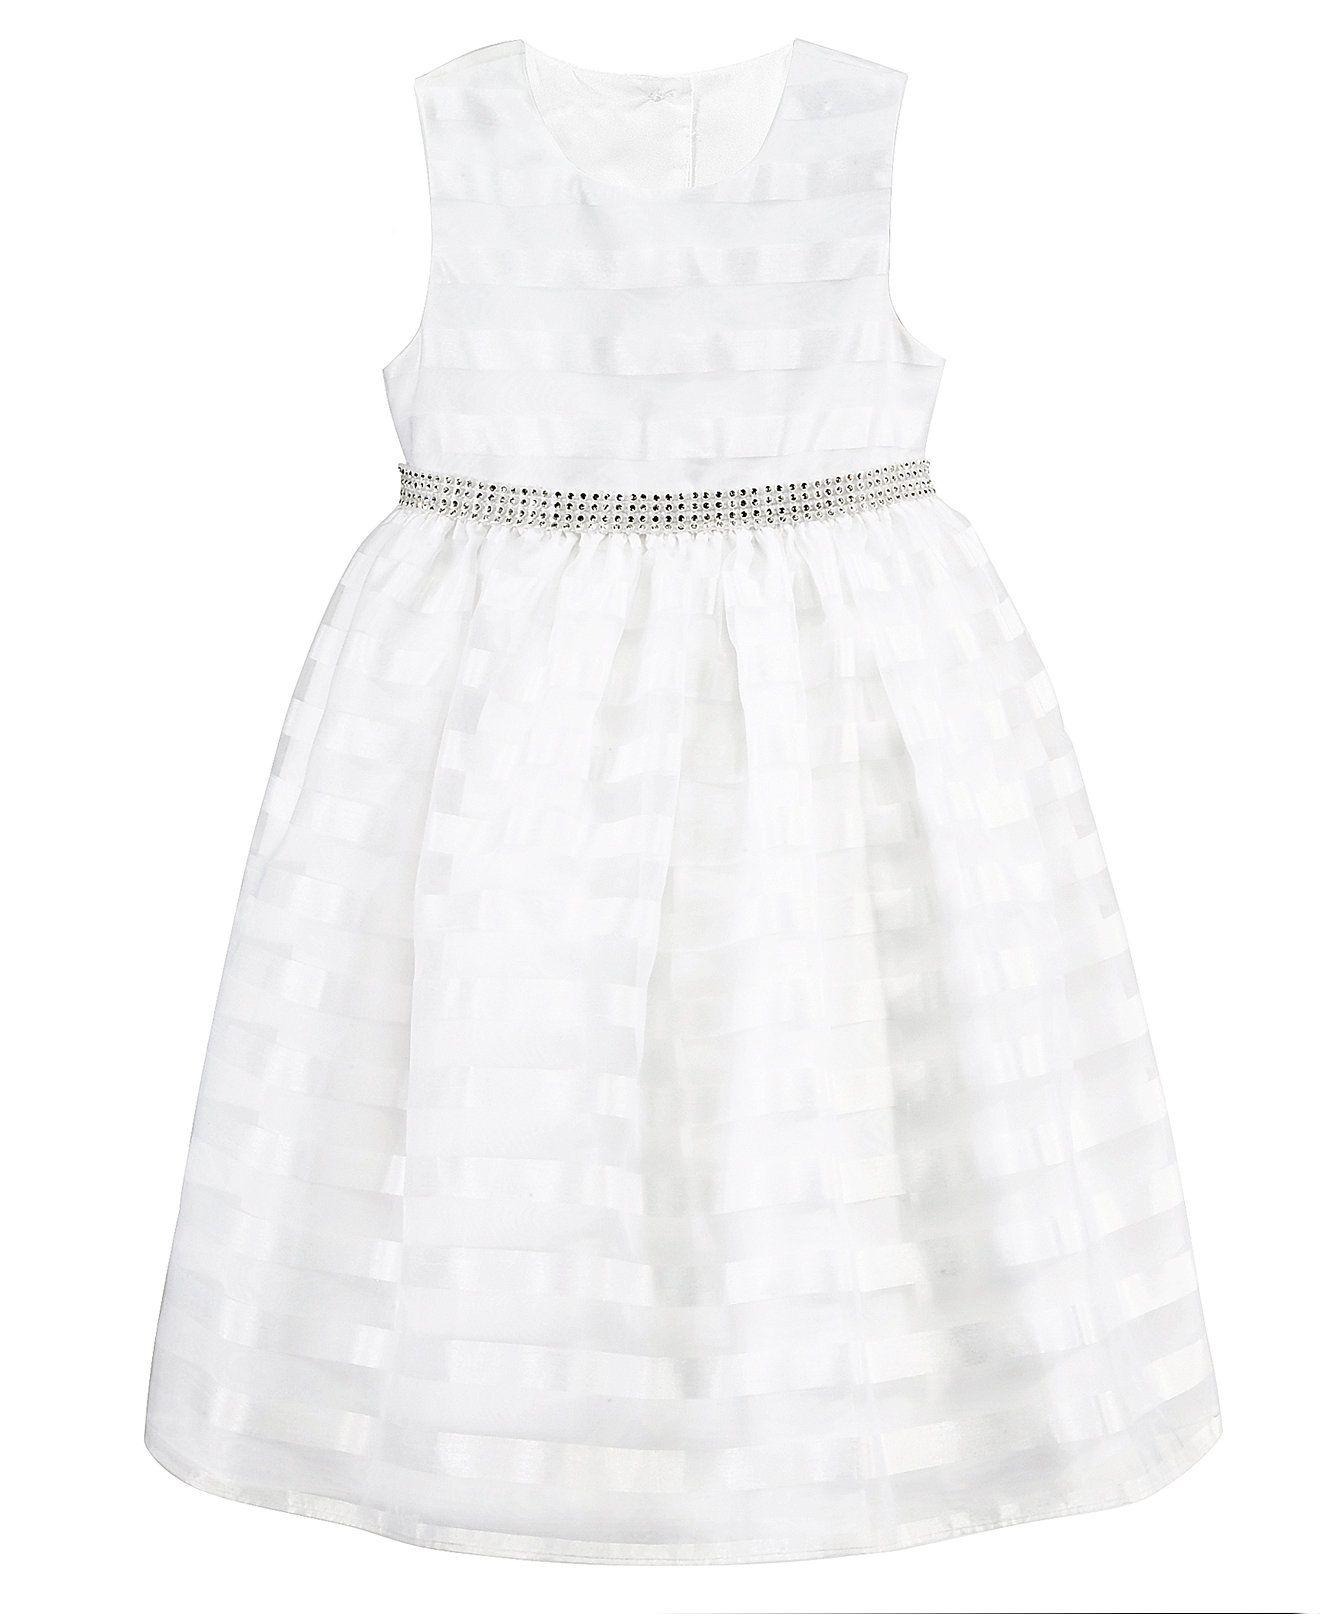 Marmellata Girls Striped Organza Flower Girl Dress Kids & Baby